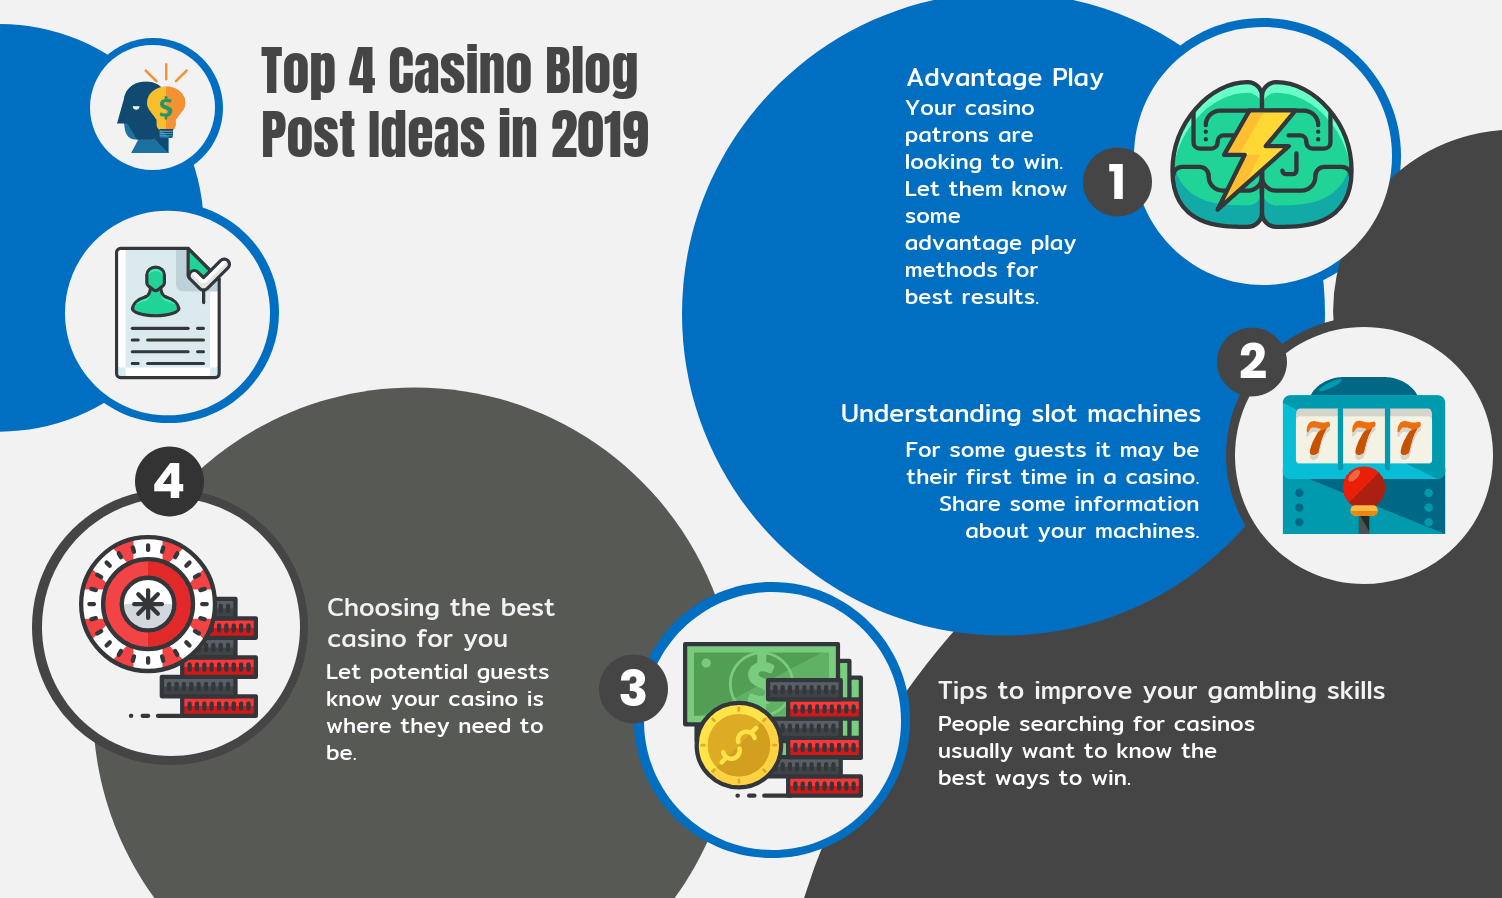 Top 4 Casino Blog Post Ideas in 2019